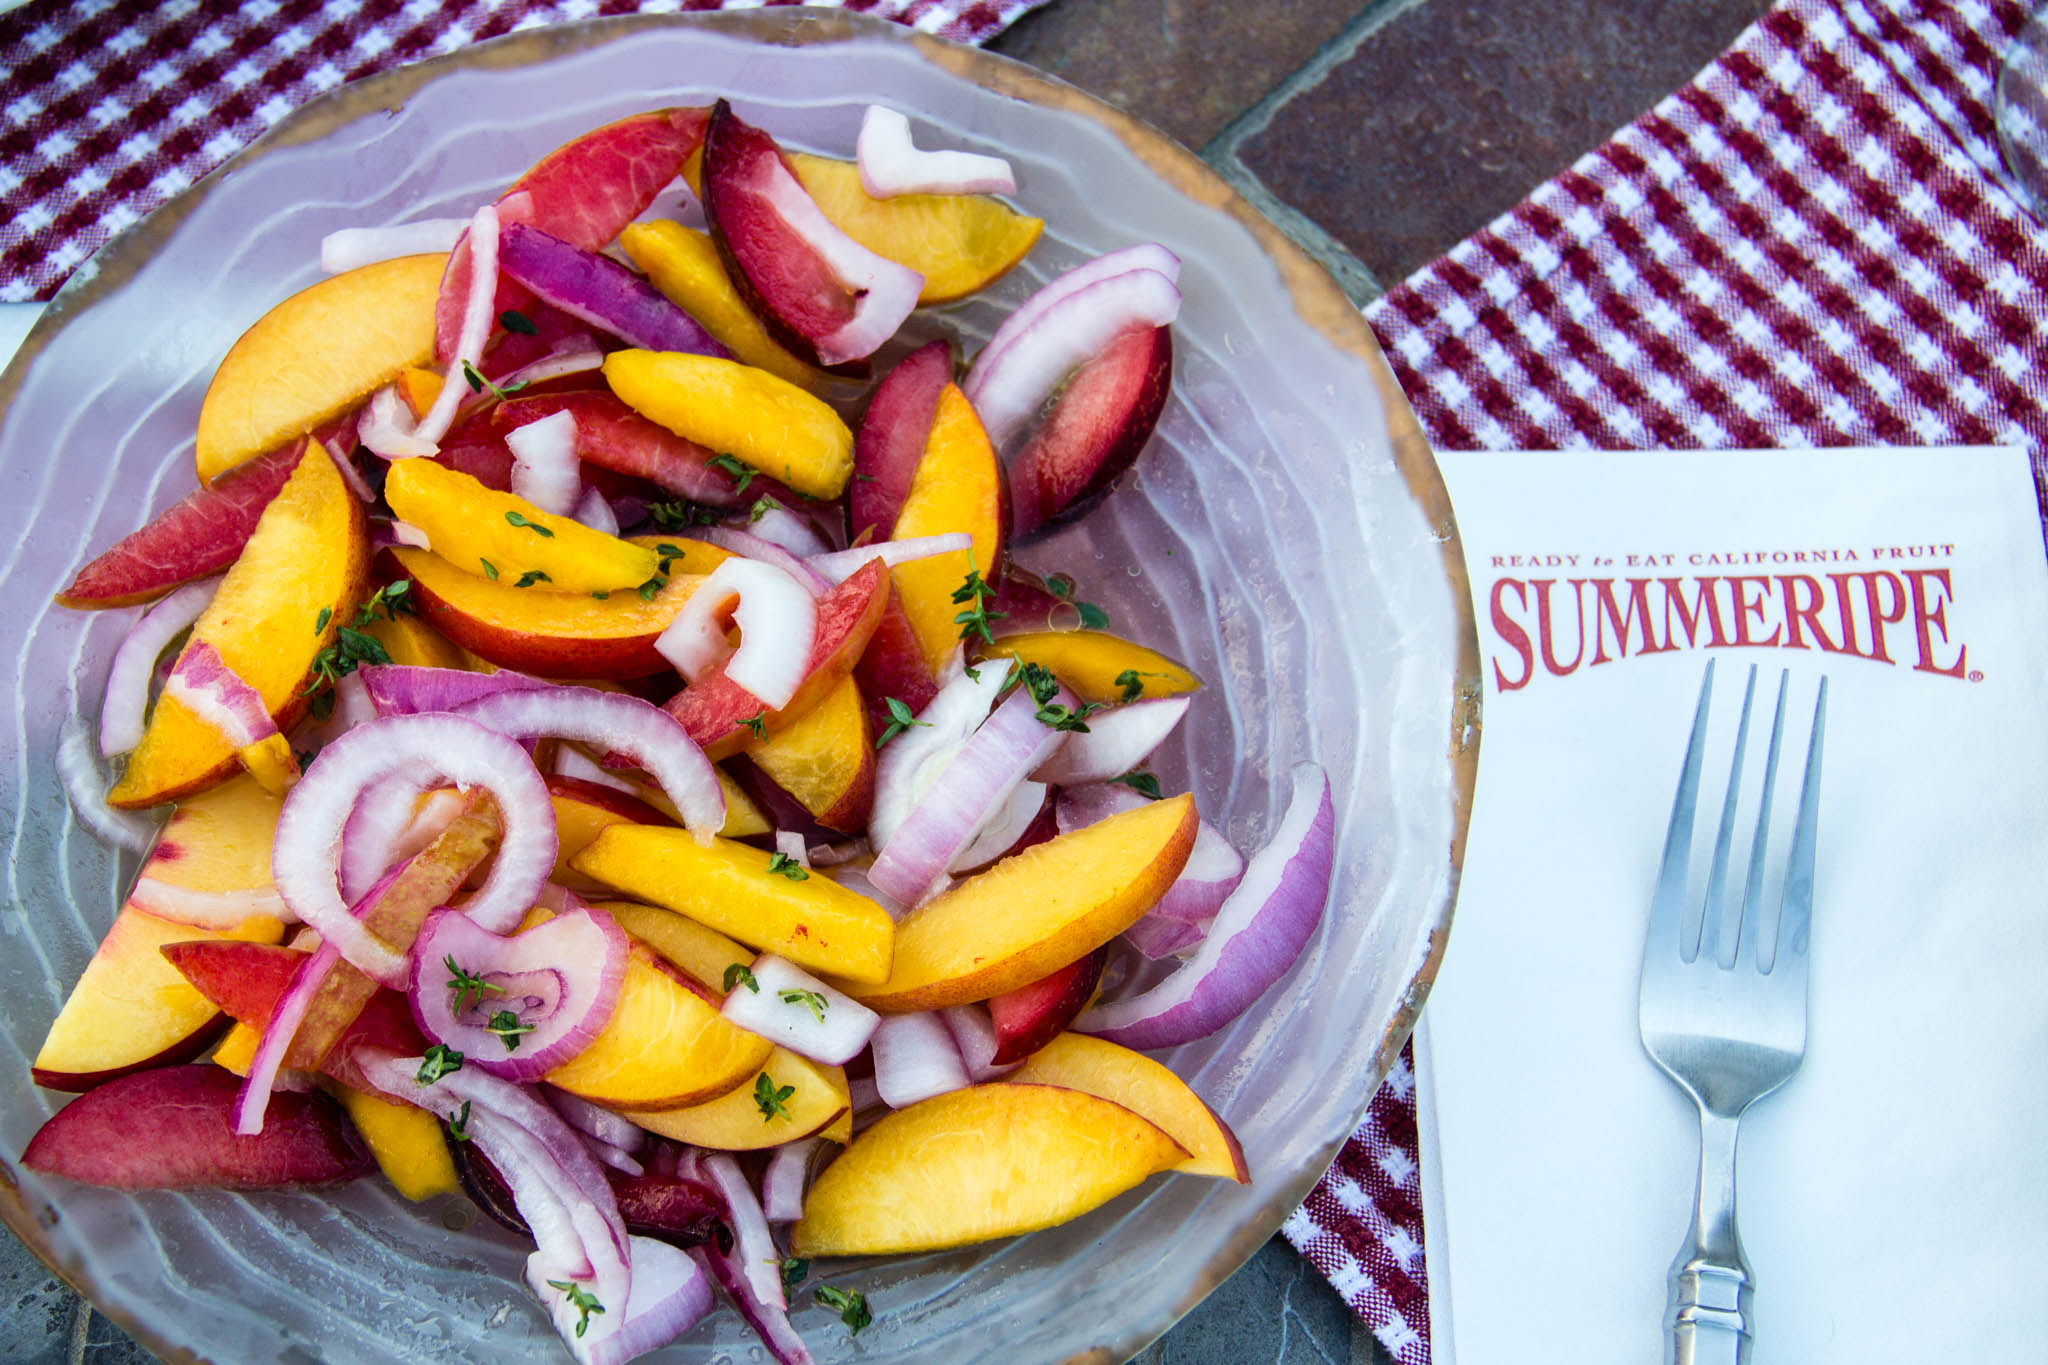 Summeripe Yellow Peach and Onion Salad